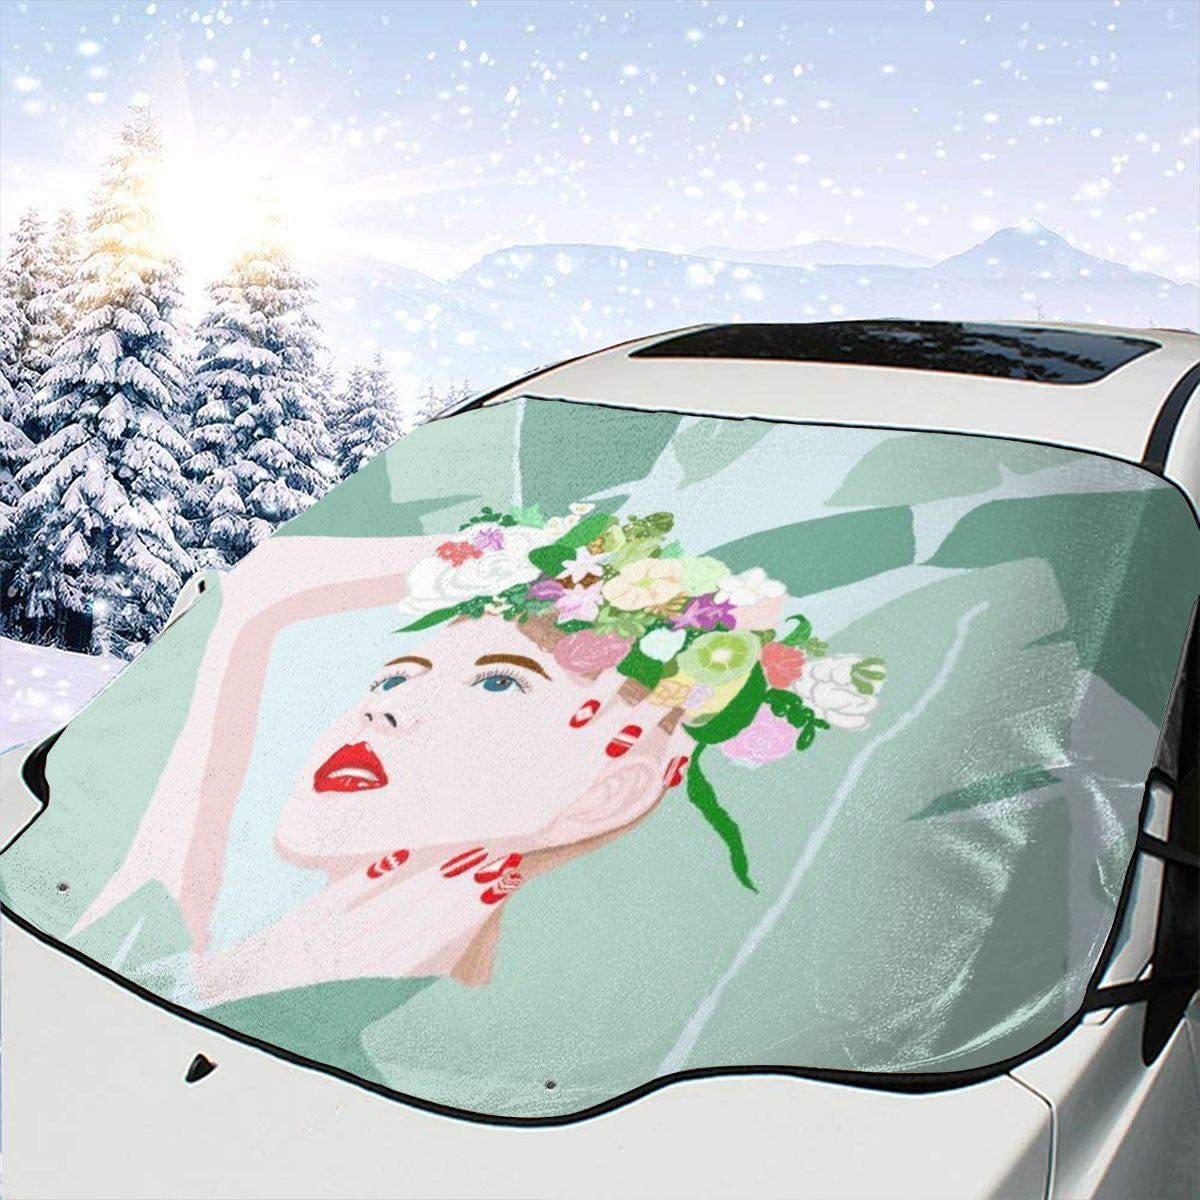 THONFIRE Car Front Window Windshield Frost Sun Shades Banana Leaf Leaves Girl Cover Windproof Blocks Heat Damage Free Visor Protector Trucks Spring Heatshield